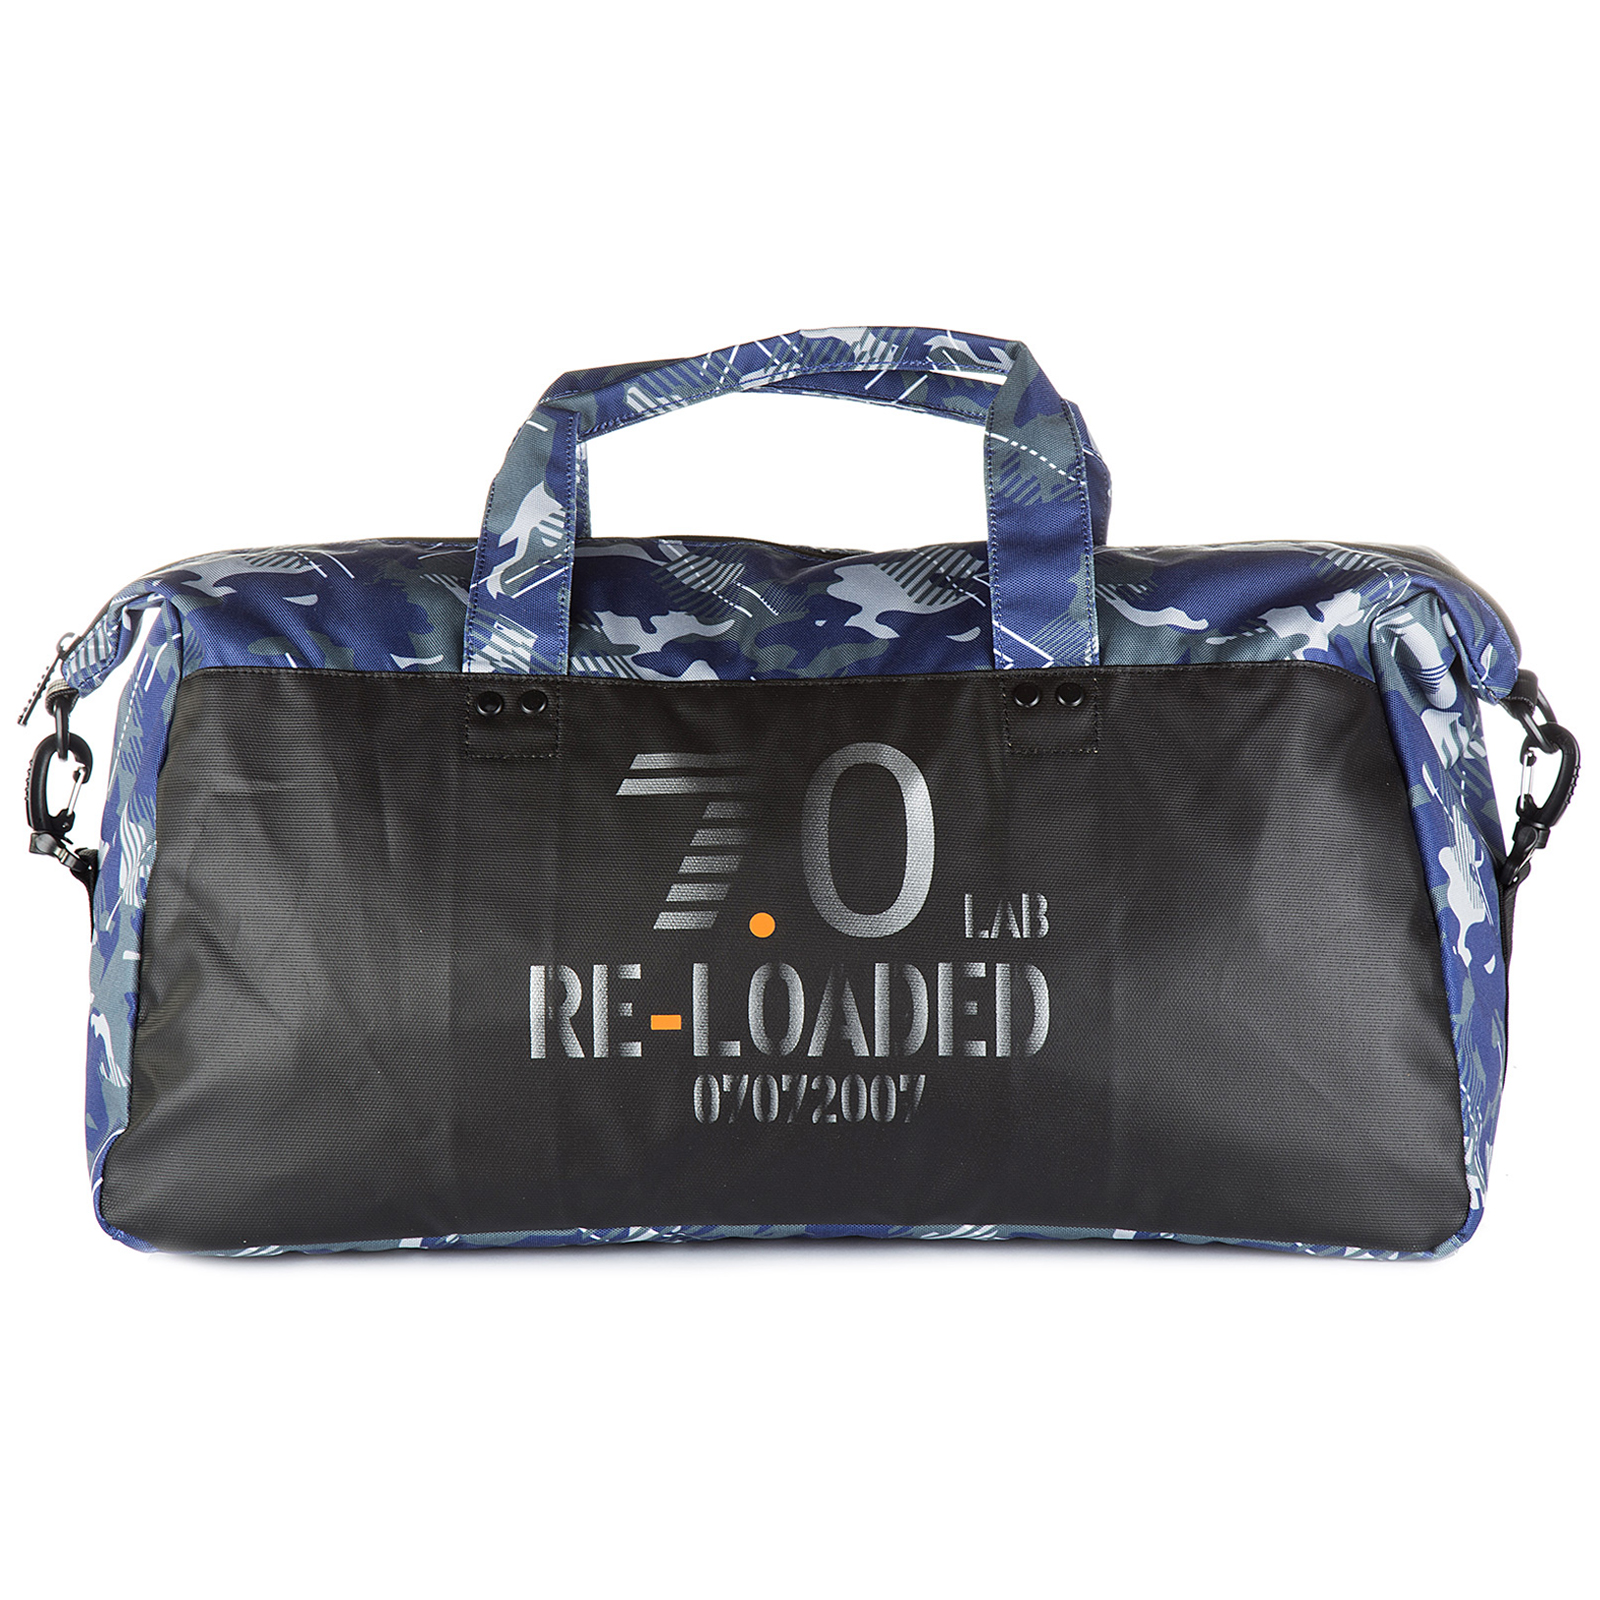 b4cfc37e19f0 Gym bag Emporio Armani EA7 275684 7P804 21435 printed blue